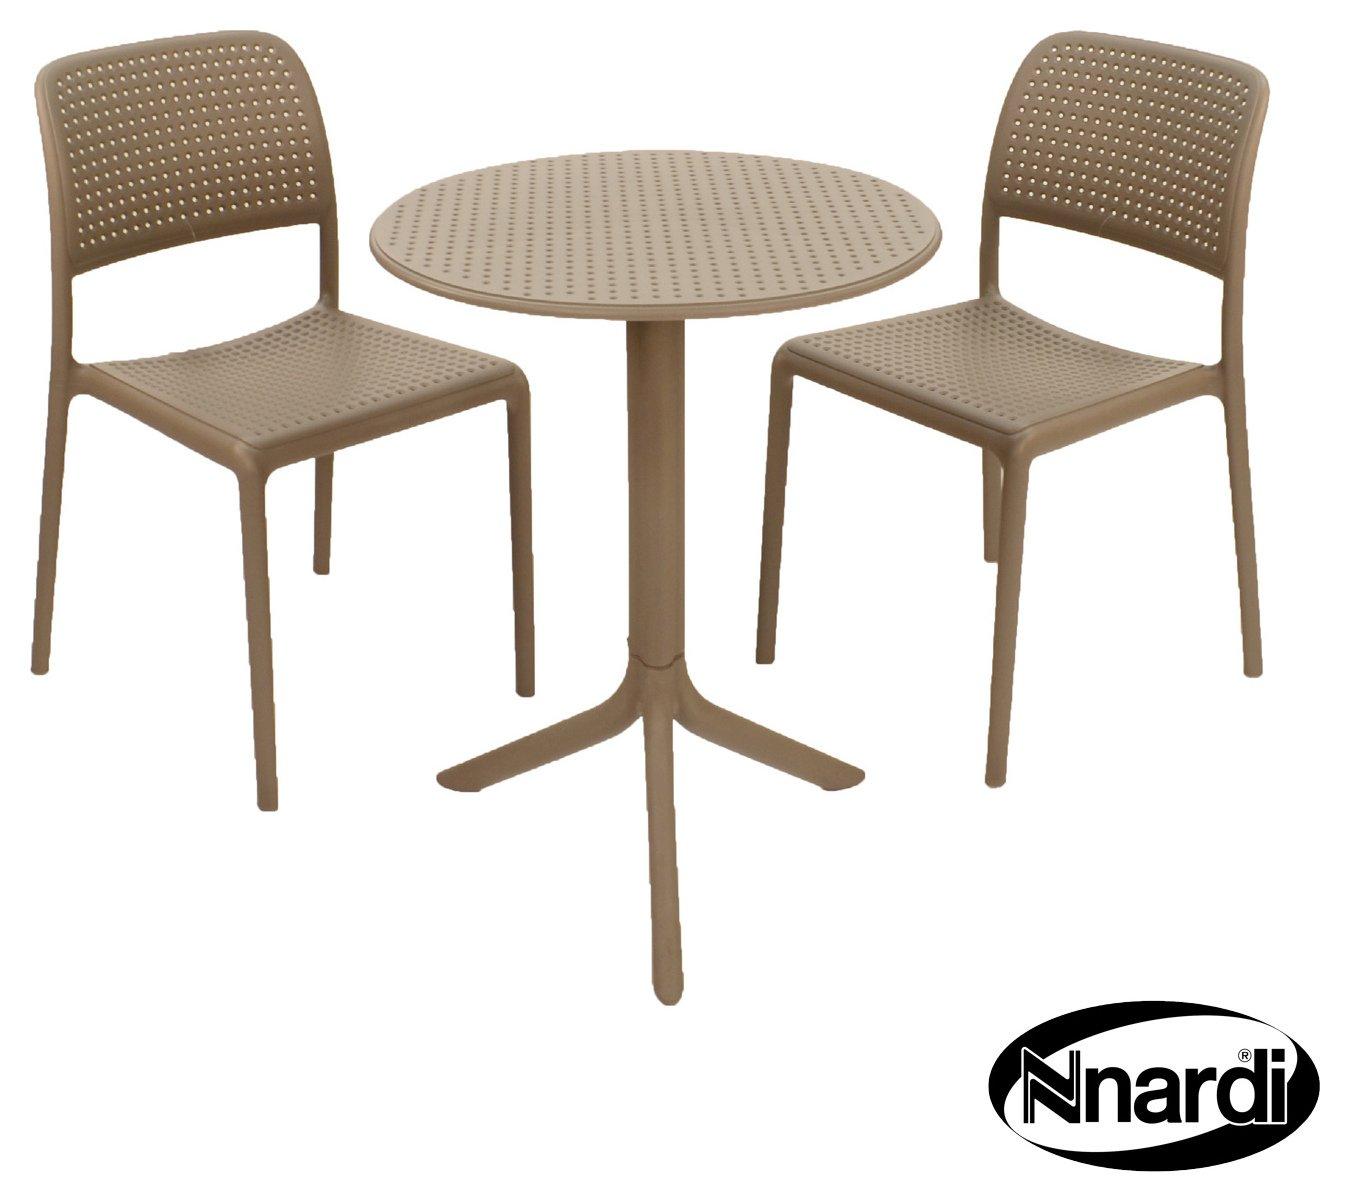 Nardi Turtledove Step Bistro Set with 2 Chairs - Grey. lowest price